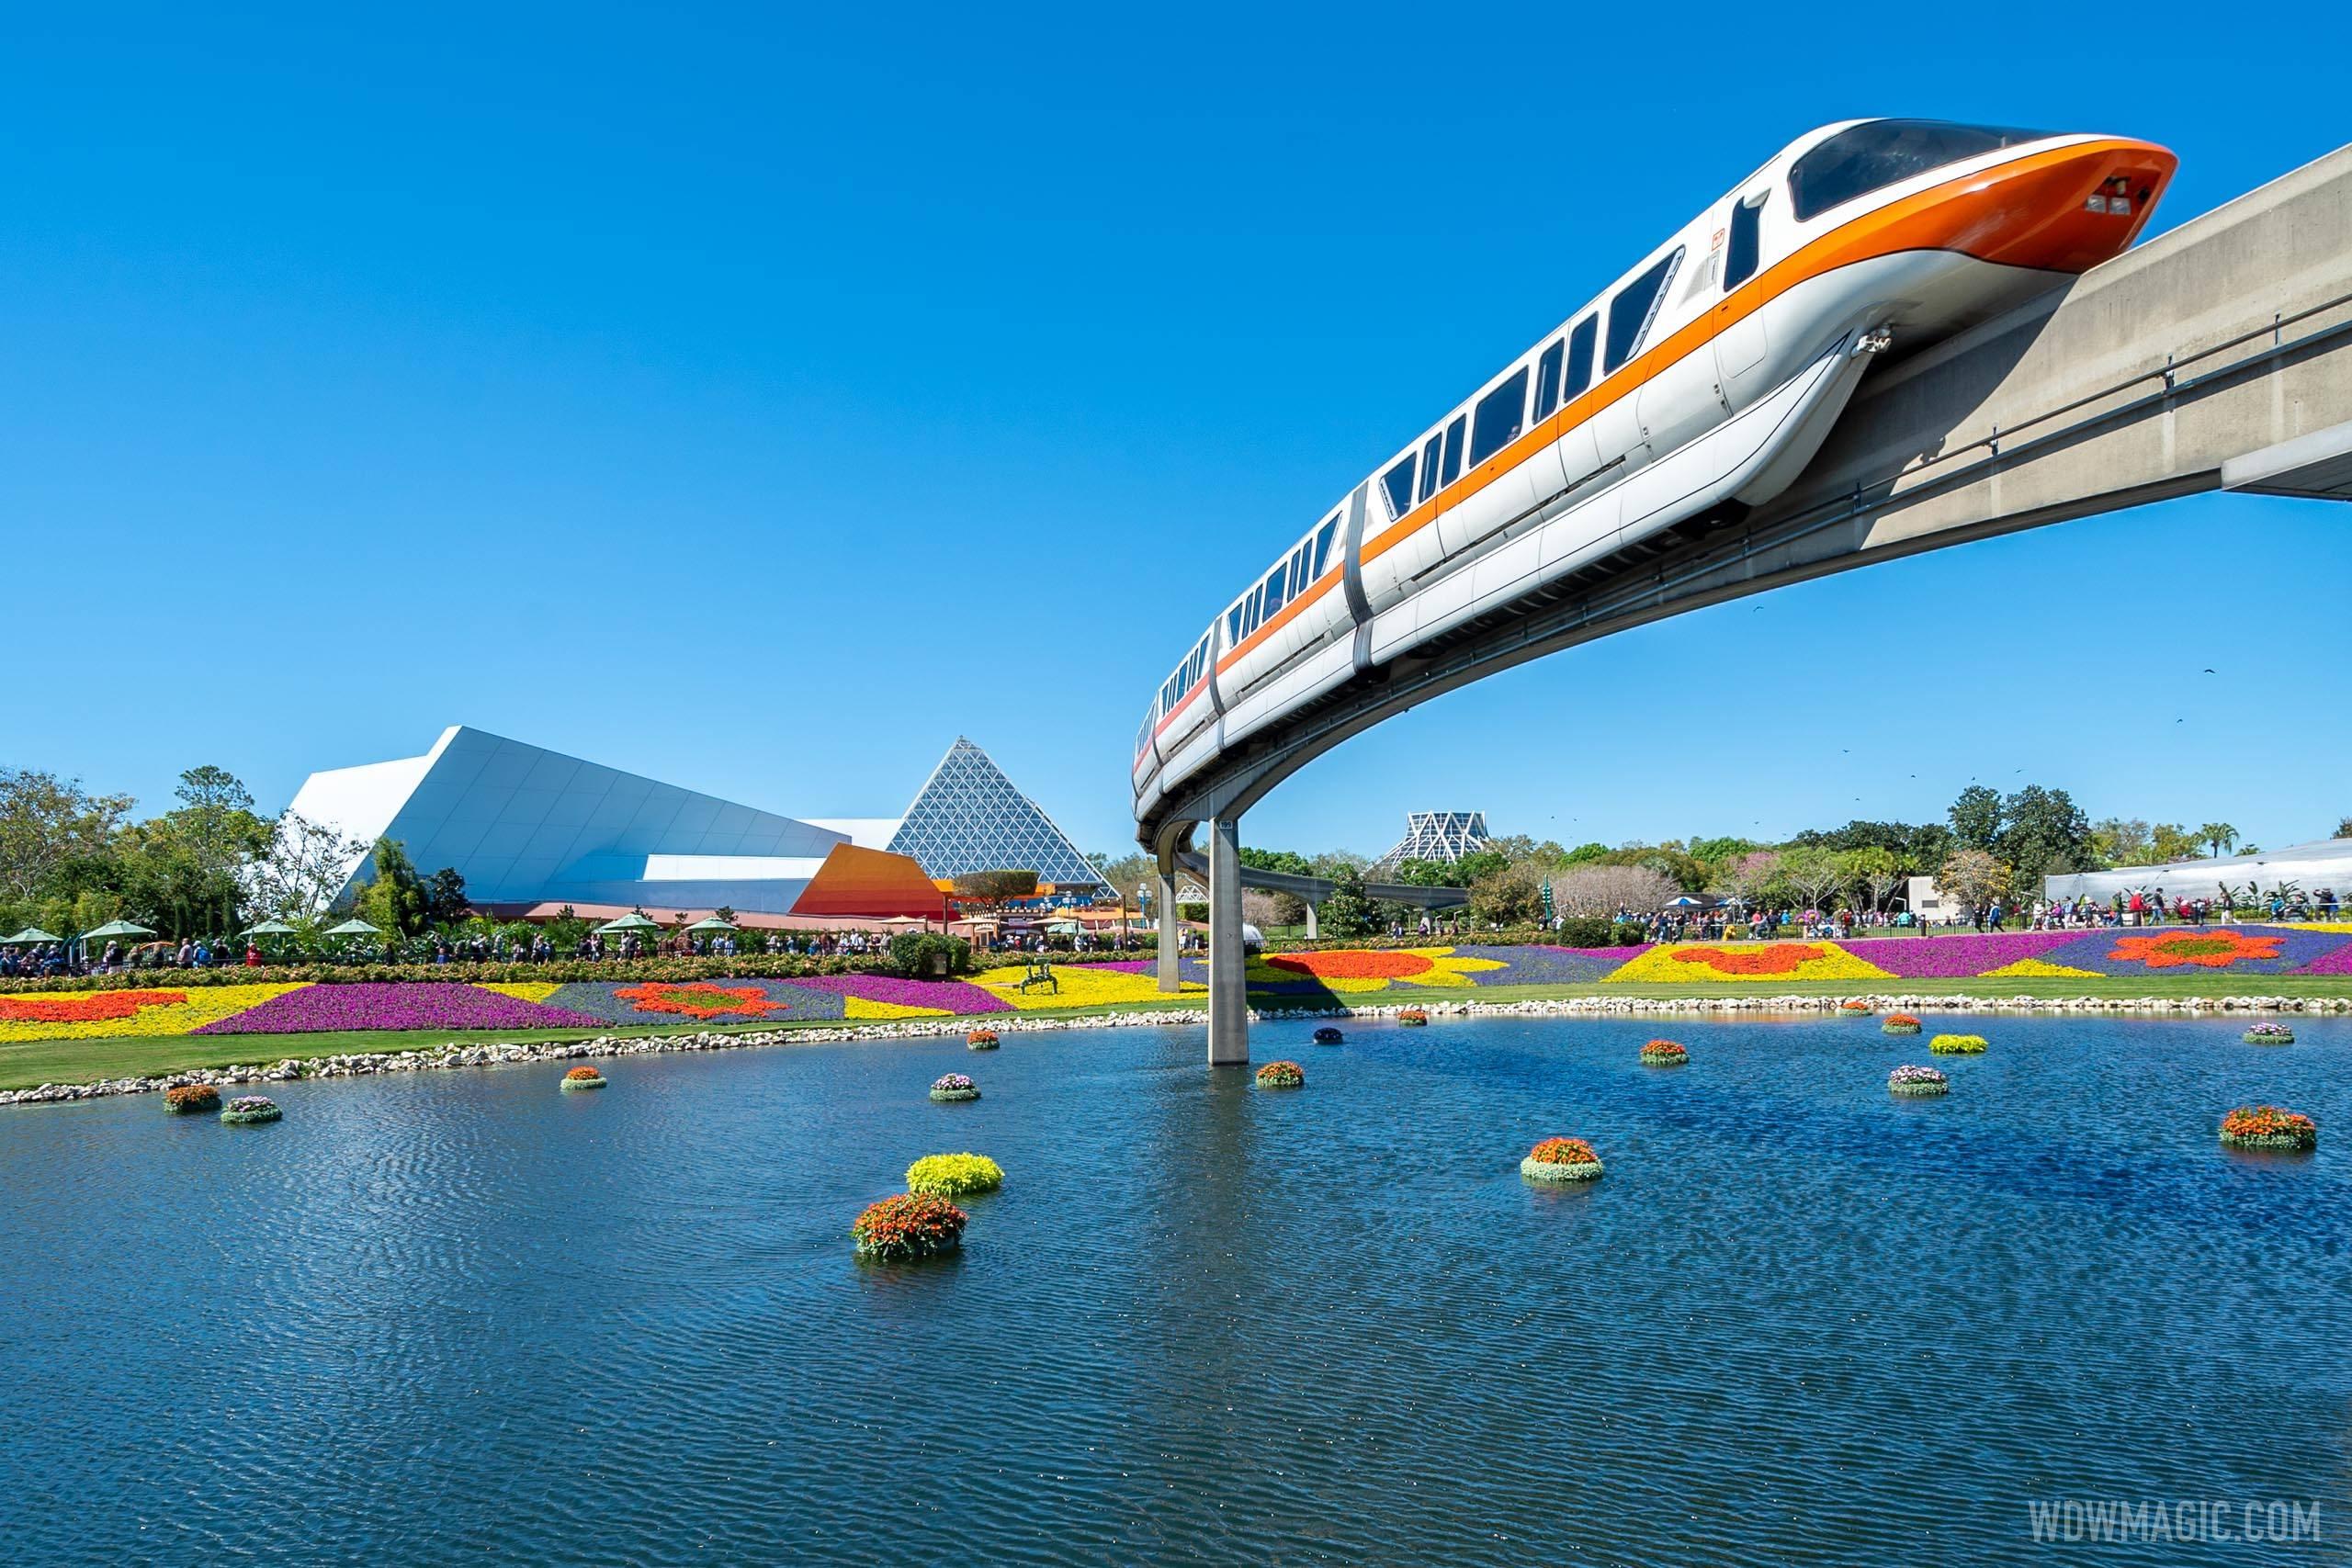 Walt Disney World Monorail System overview